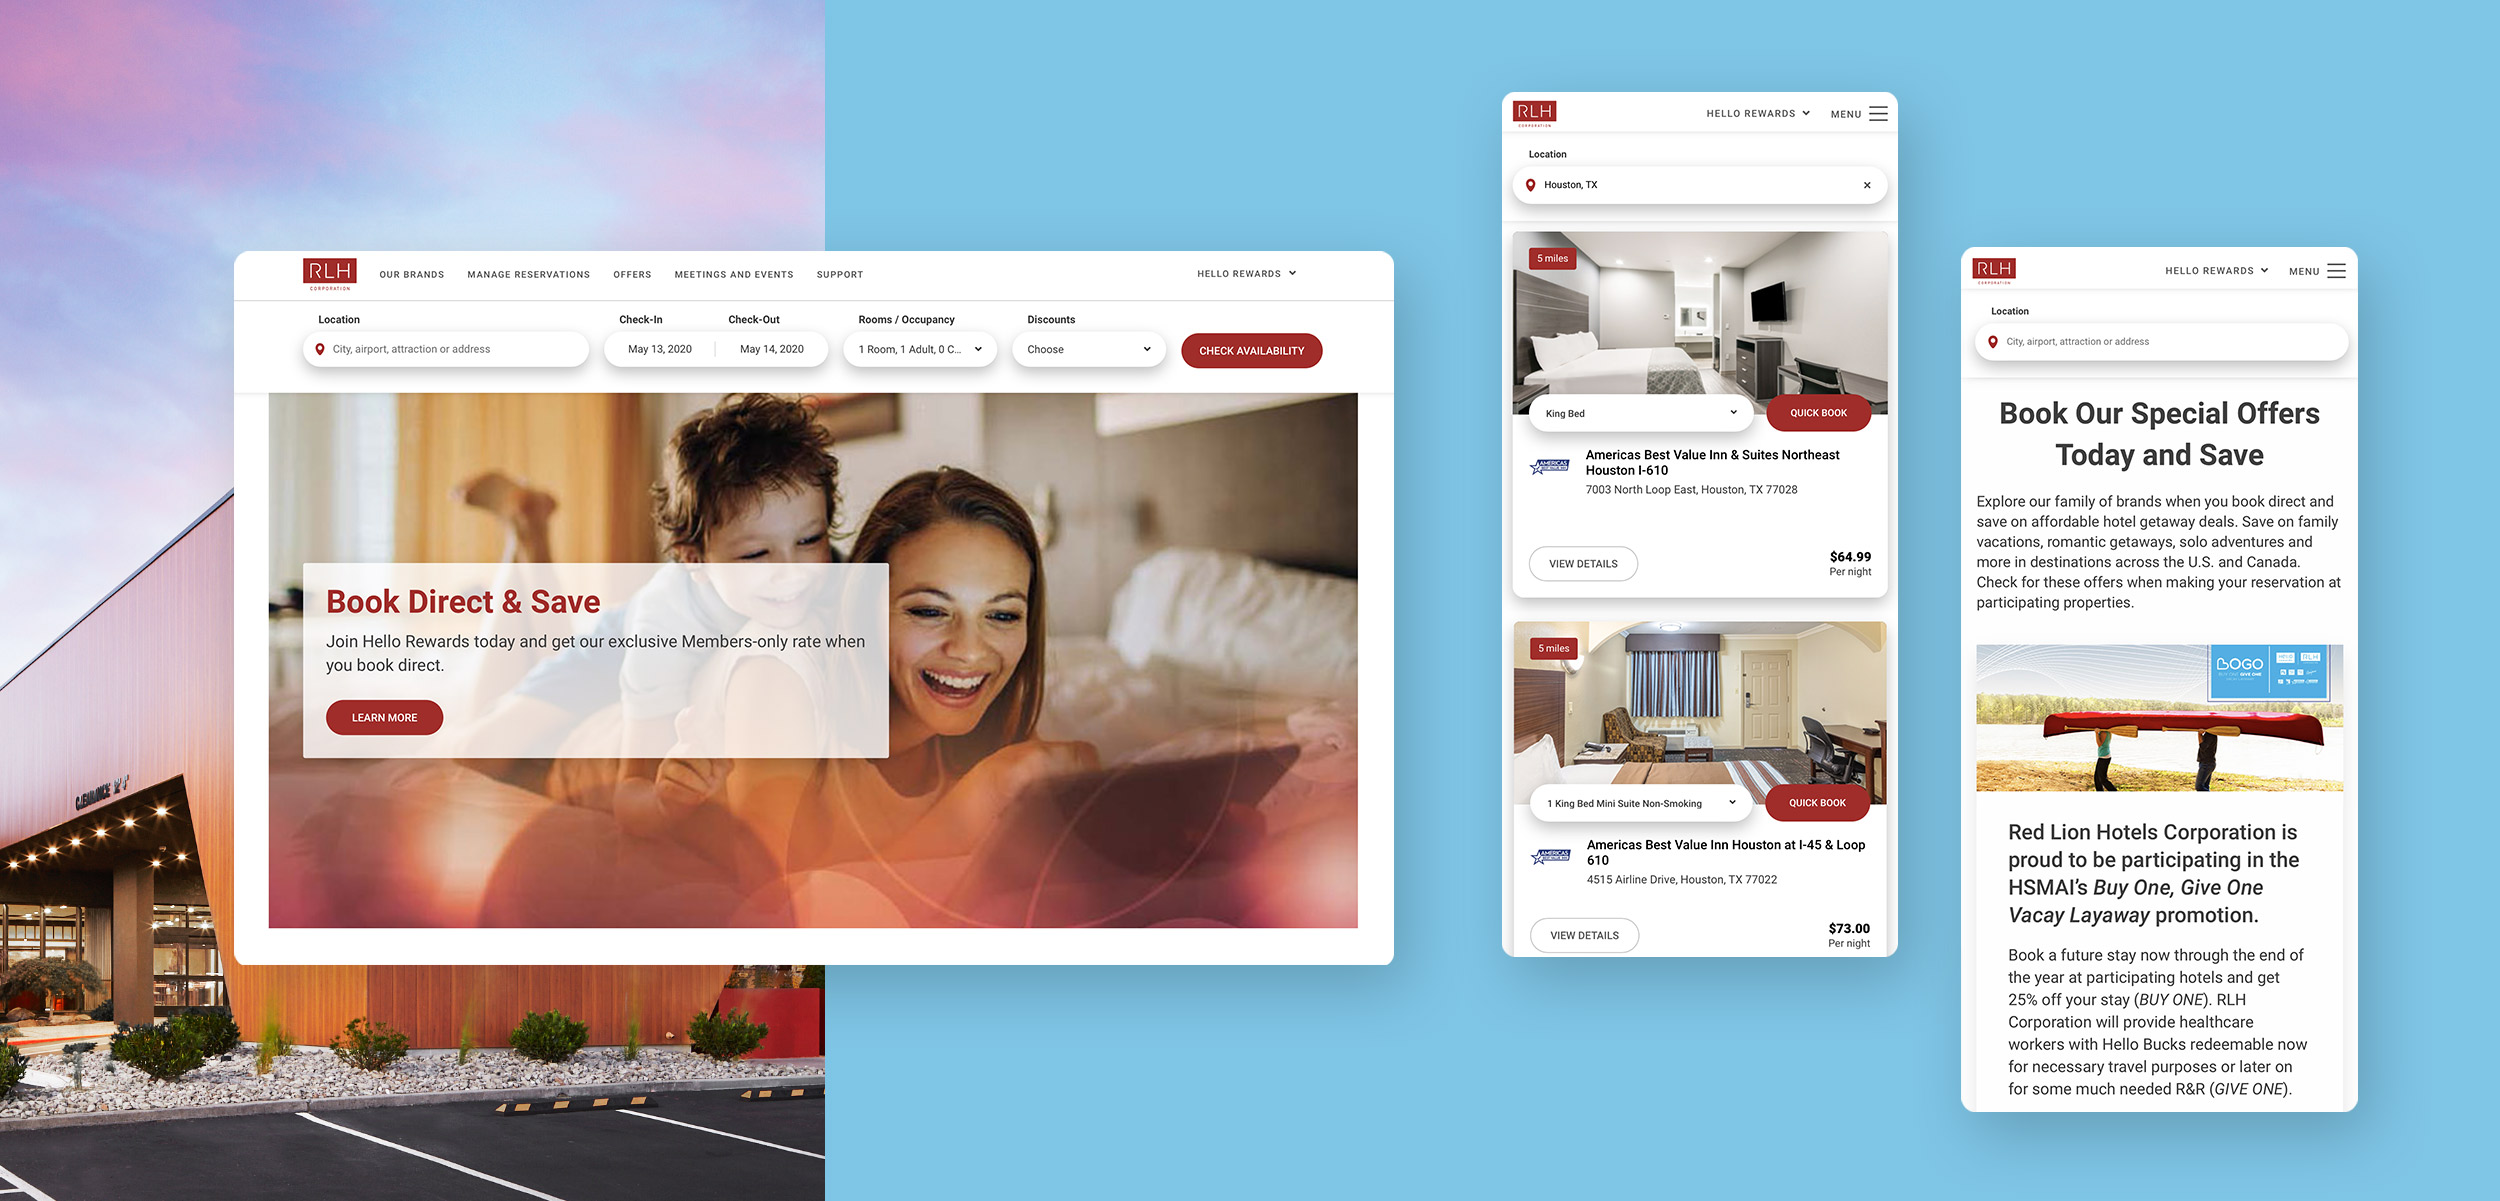 Redlion.com enterprise website